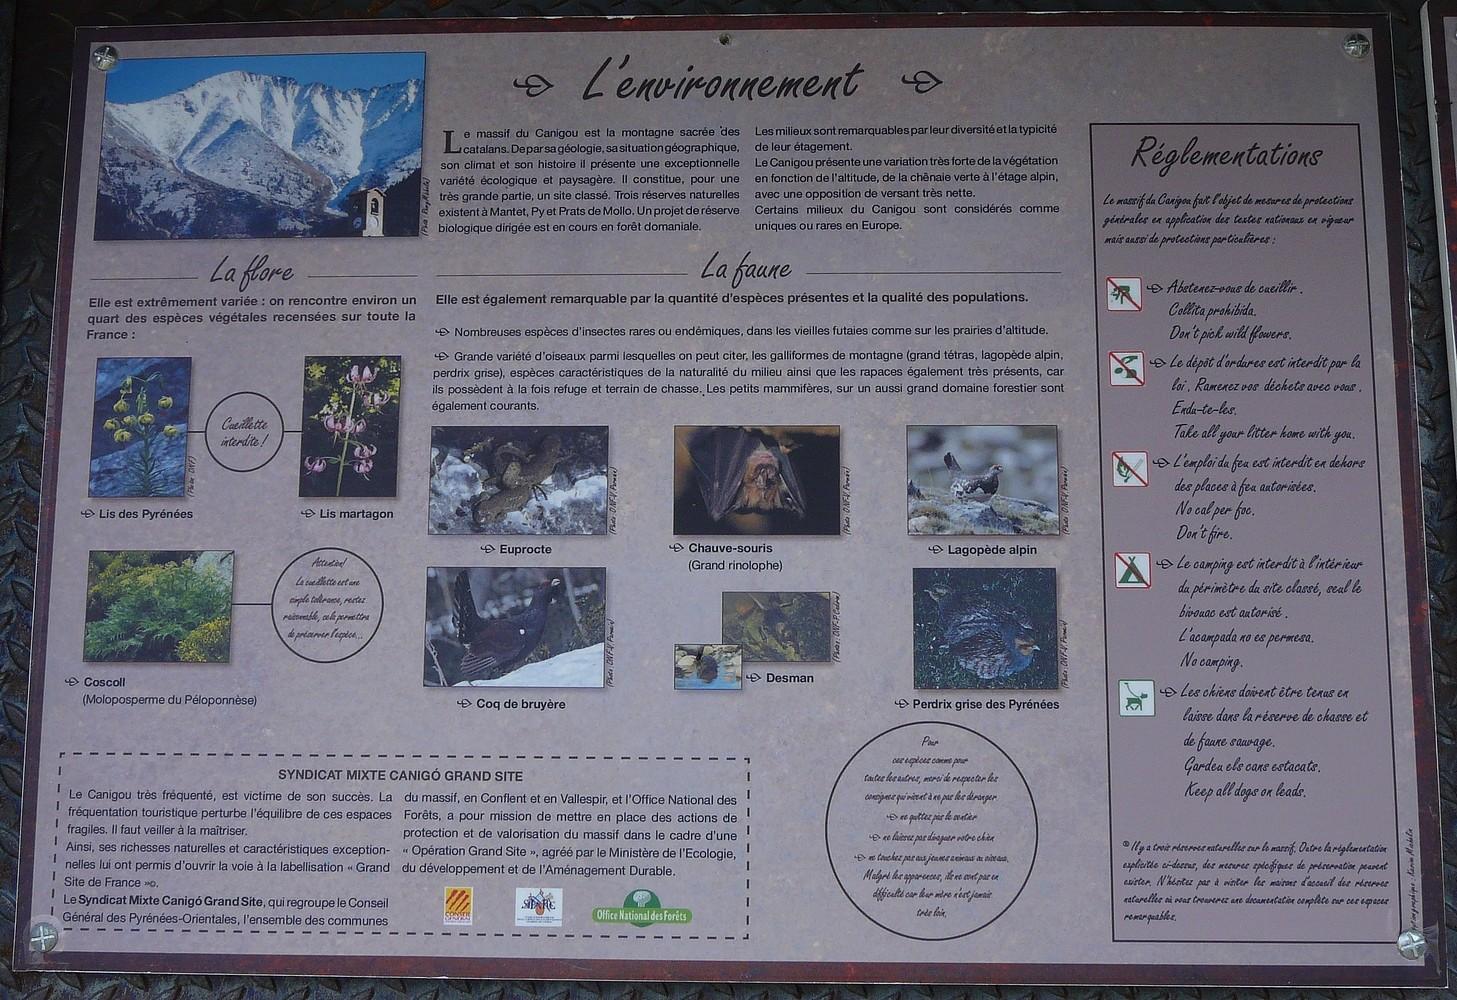 L'envirronement du massif du Canigou